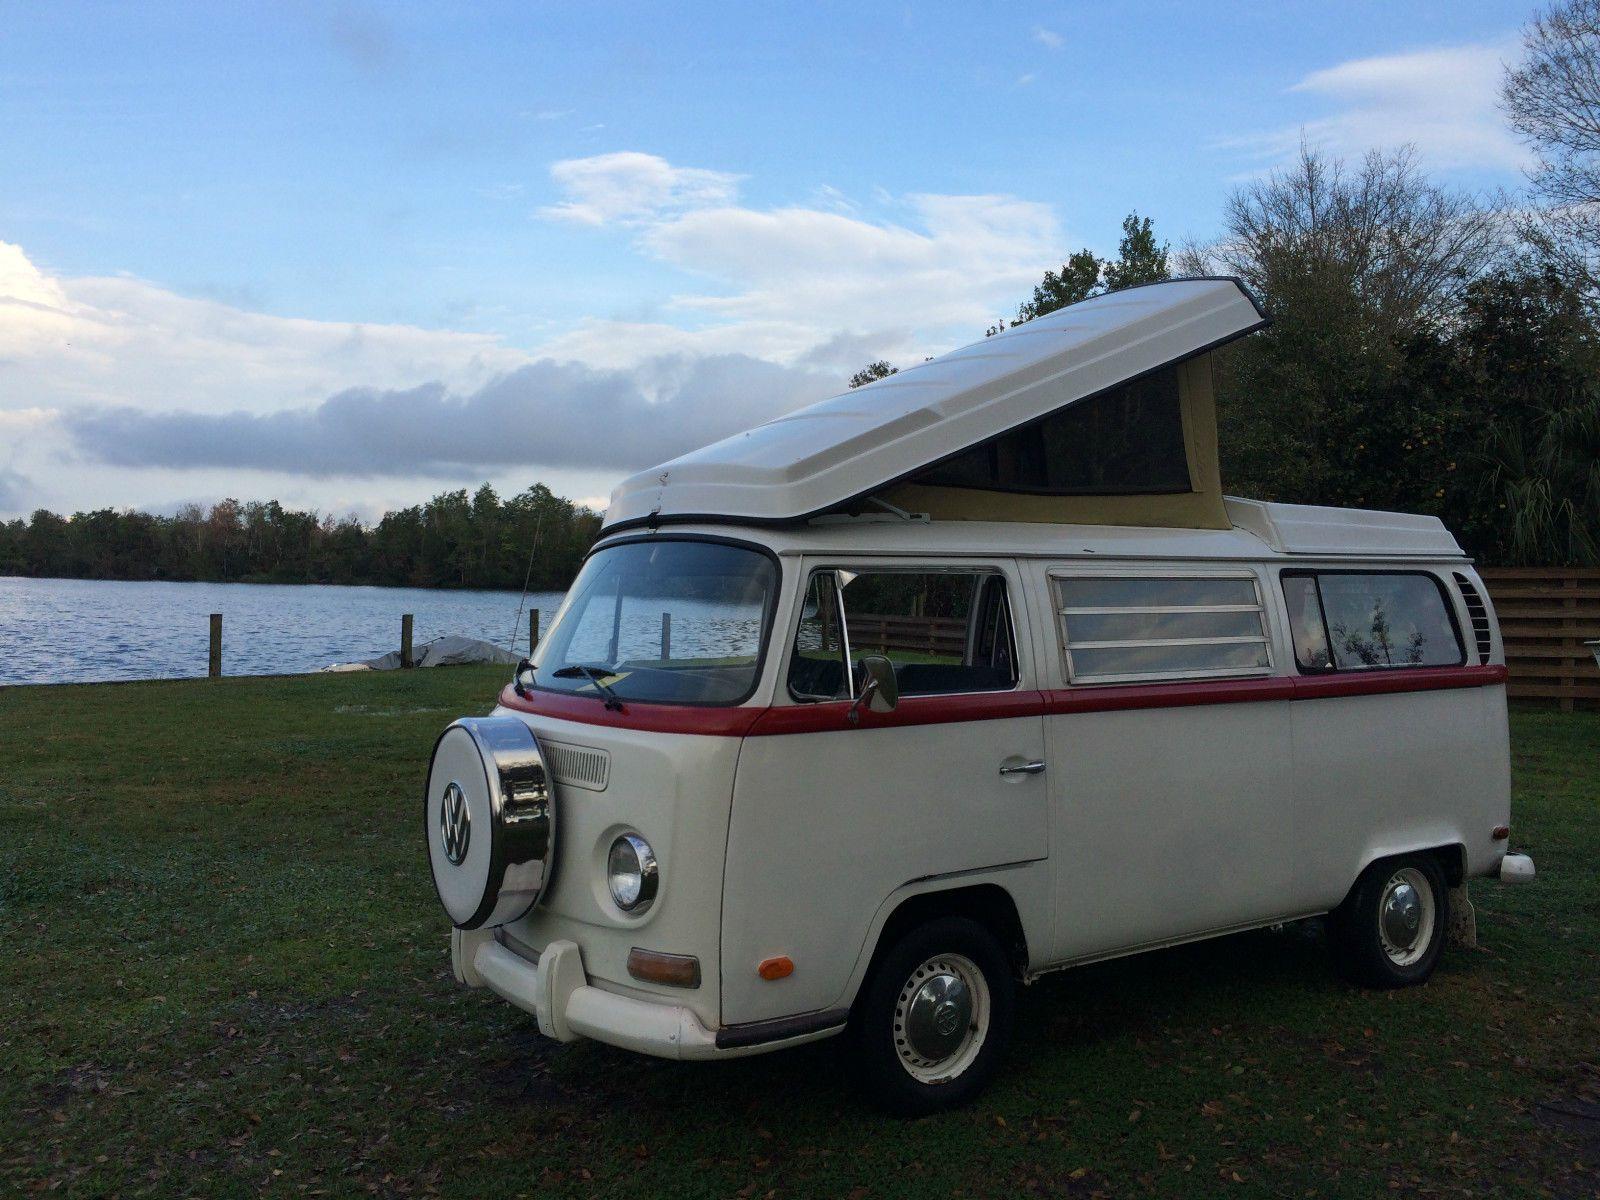 mobile camper pinterest single home vw and wide champagne caravan pin bus varela by on francisco volkswagen